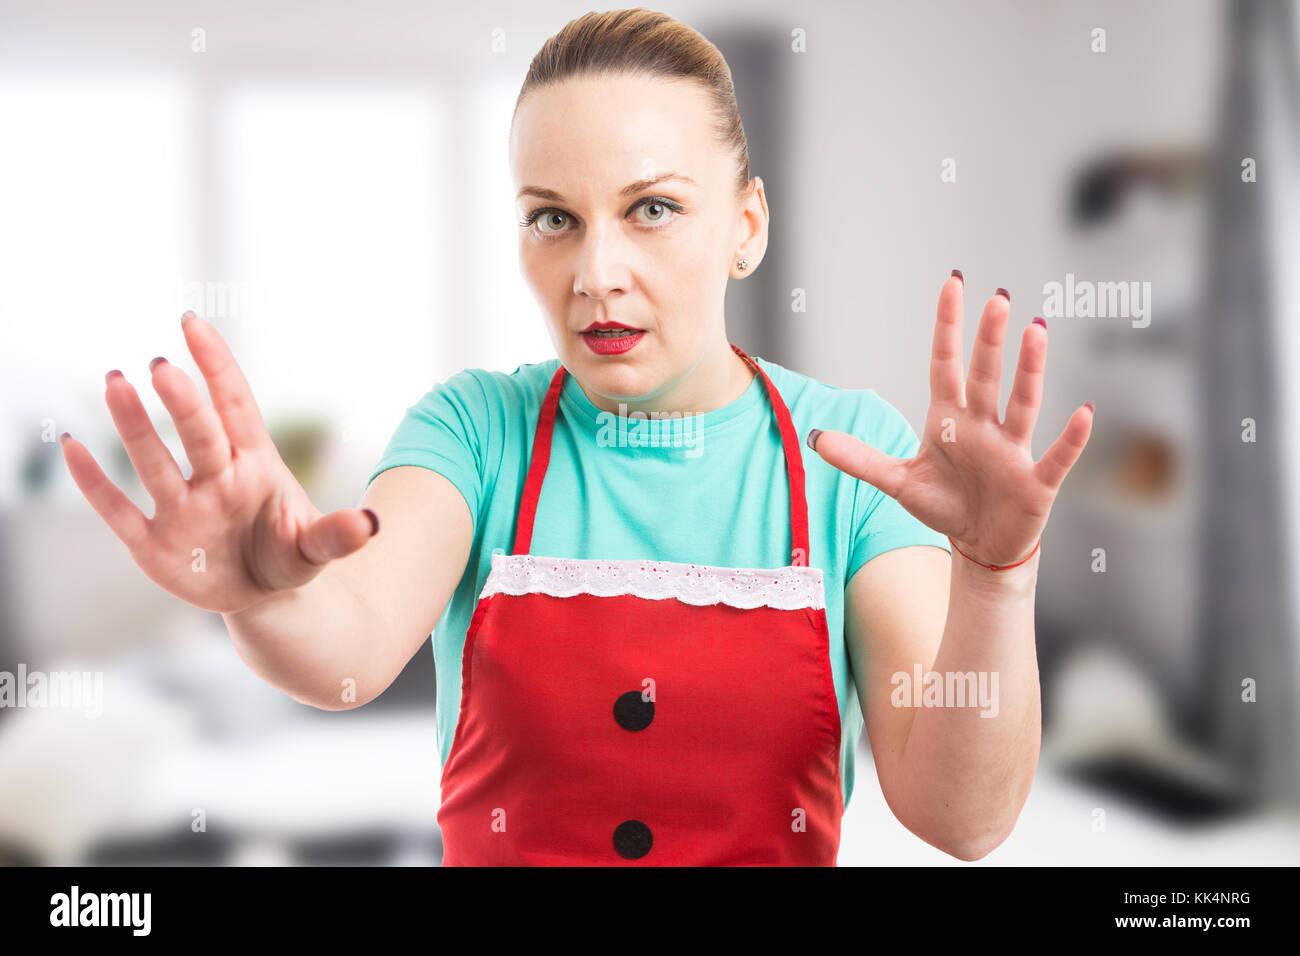 Decorative Rubber Kitchen Gloves 165 Best Gloves Images On